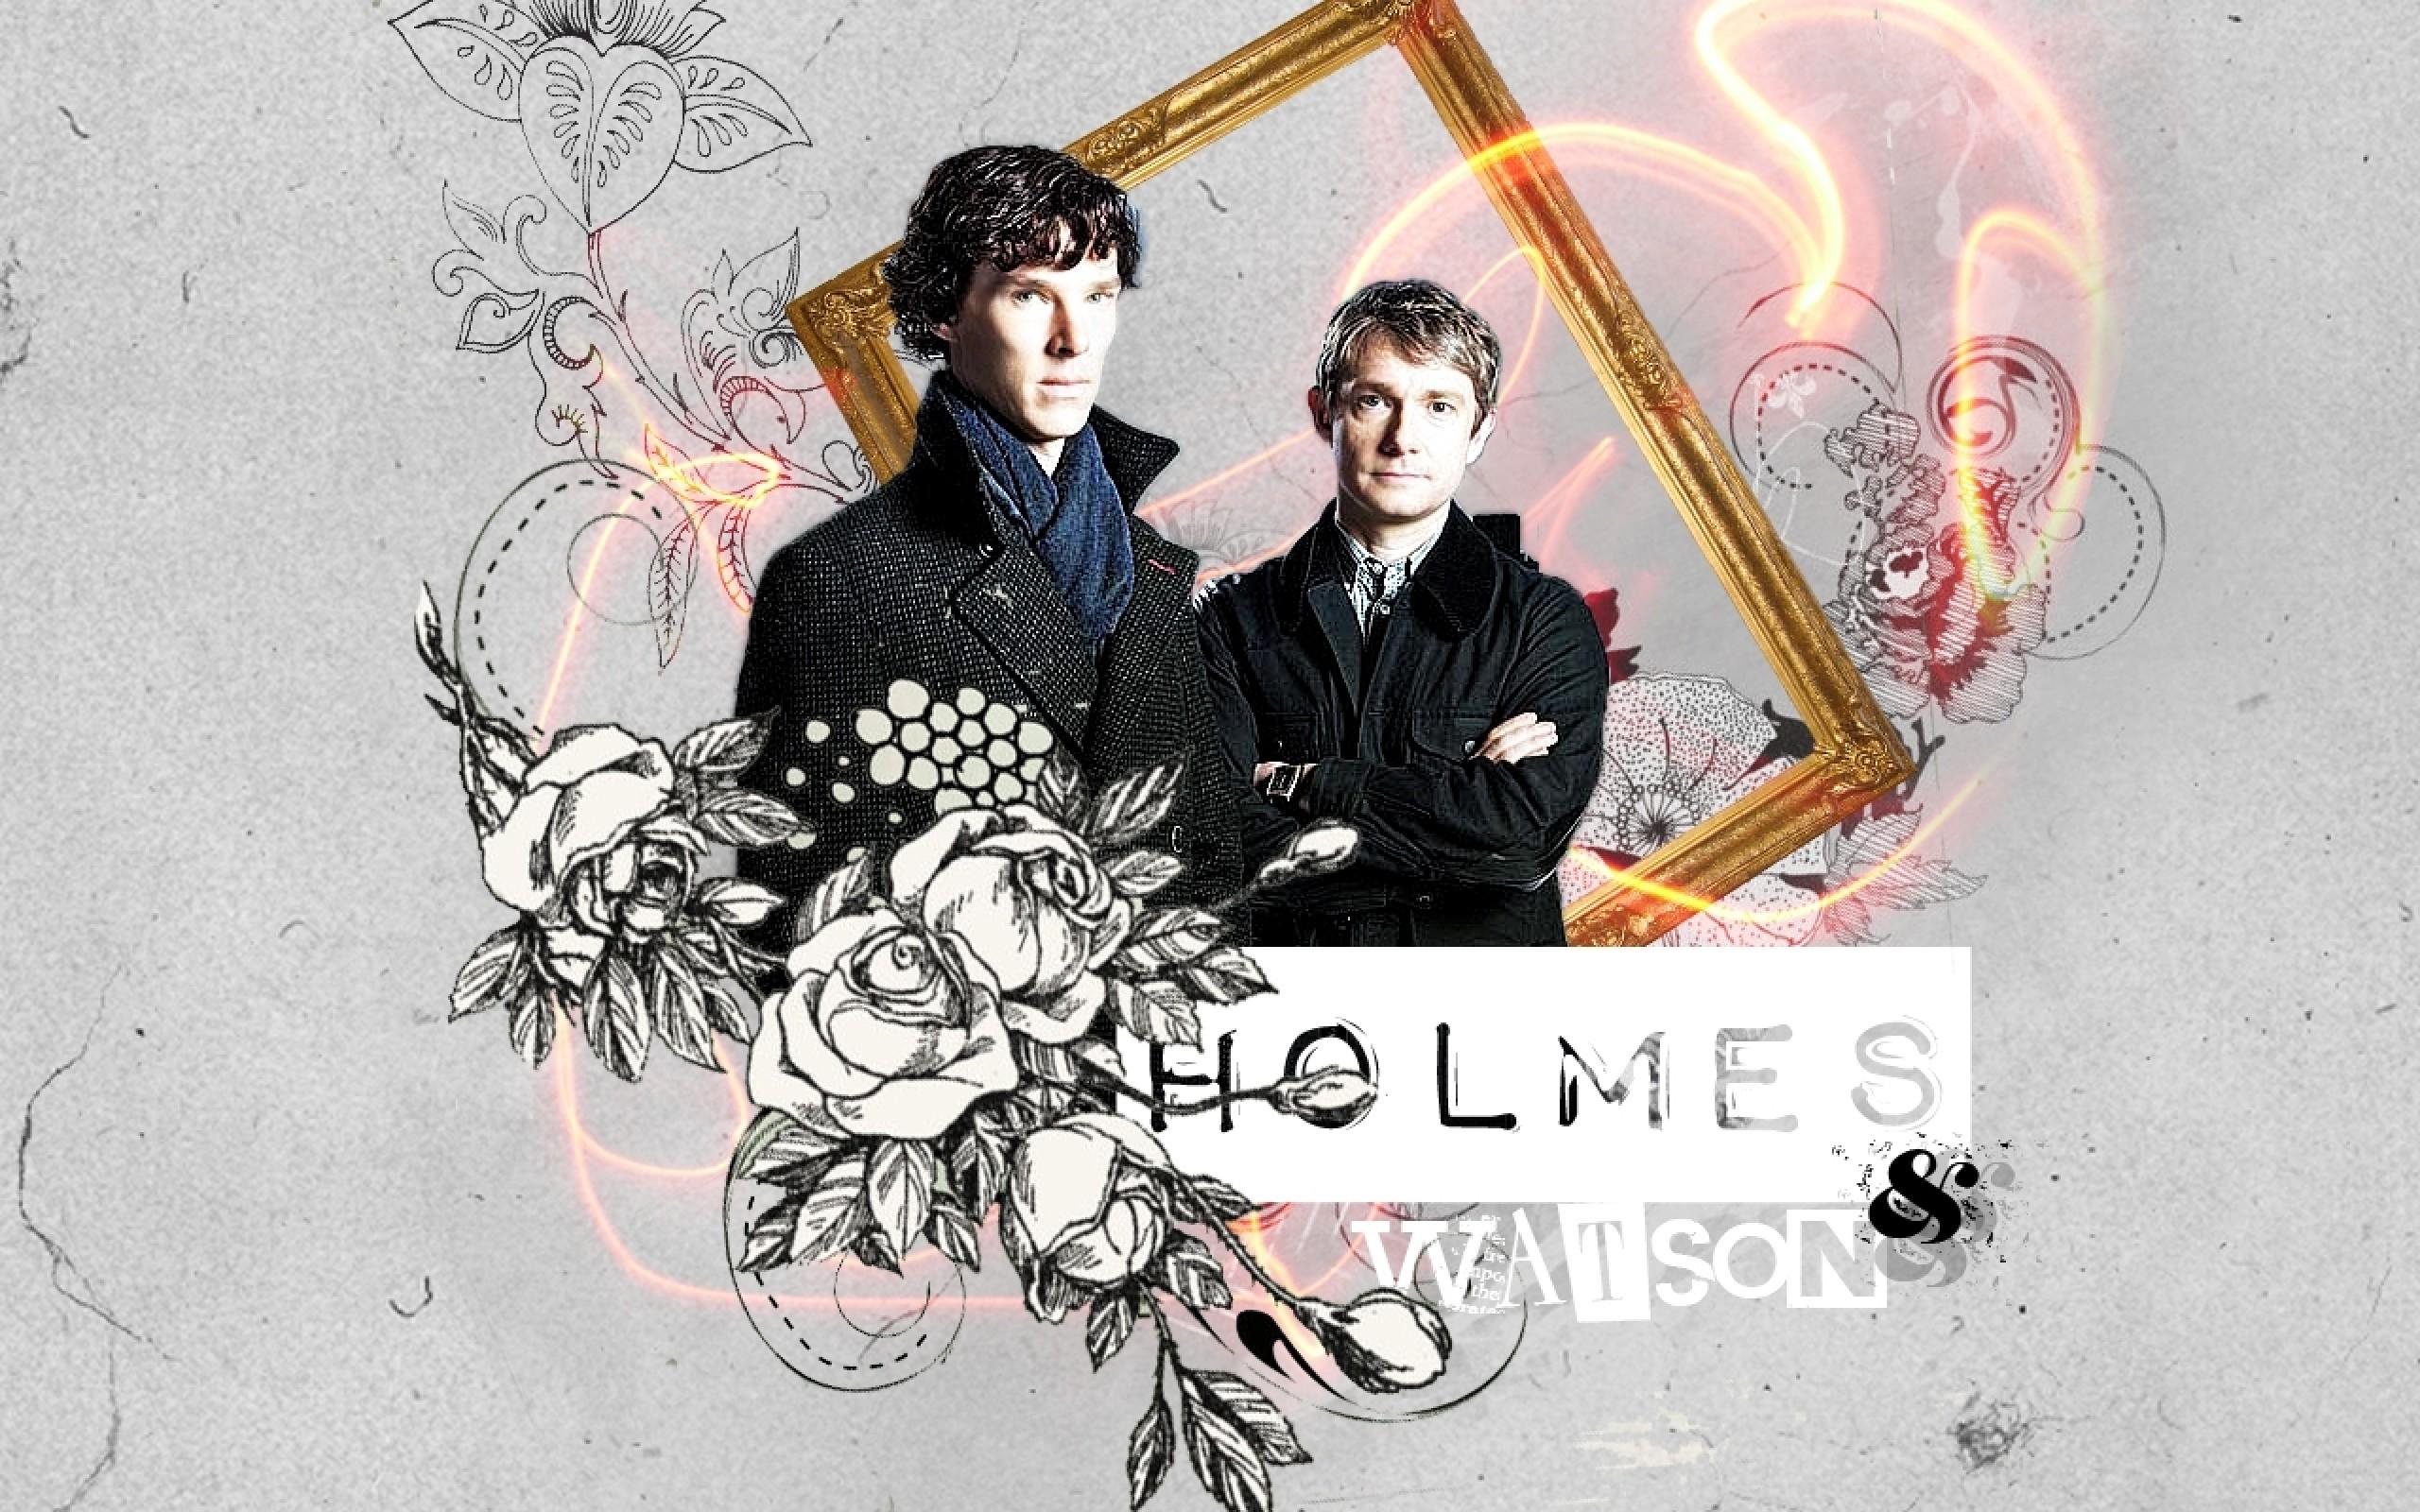 1920x1080 Sherlock Holmes 924470. SHARE. TAGS: Sherlock Holmes Benedict Cumberbatch